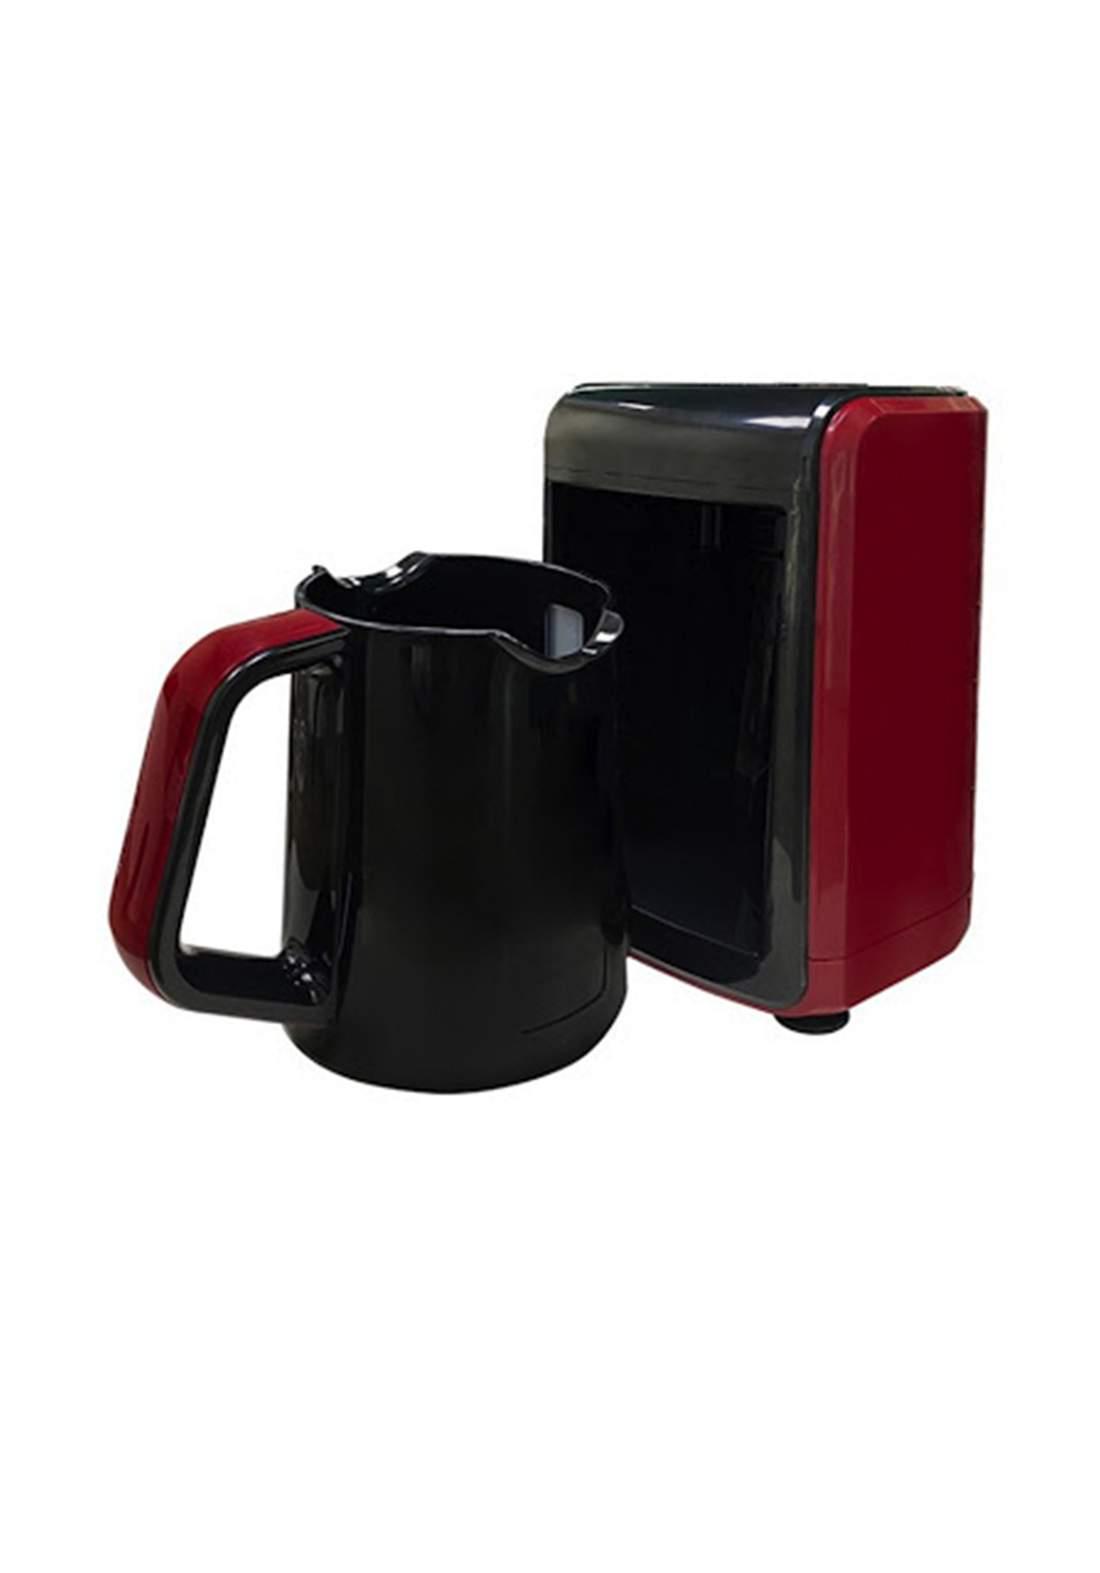 Alhafidh COAR08 Automatic Turkish Coffee Maker محضرة القهوة